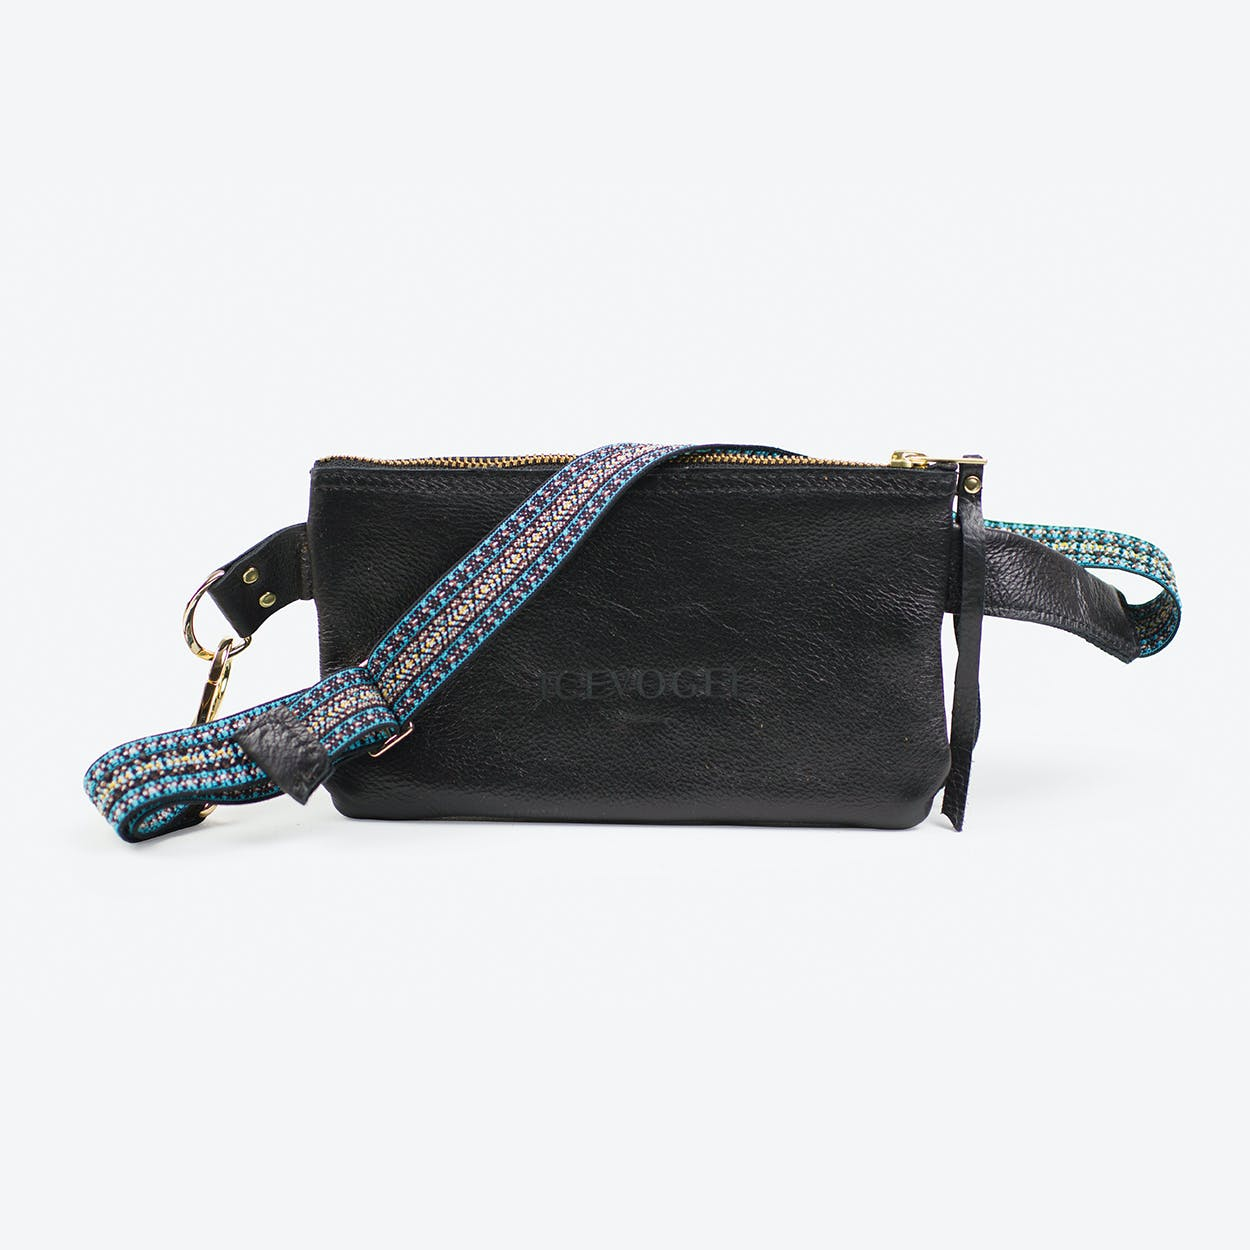 Hipbag Saatkrähe 2 in Black Cow Leather and Bohemian Strap